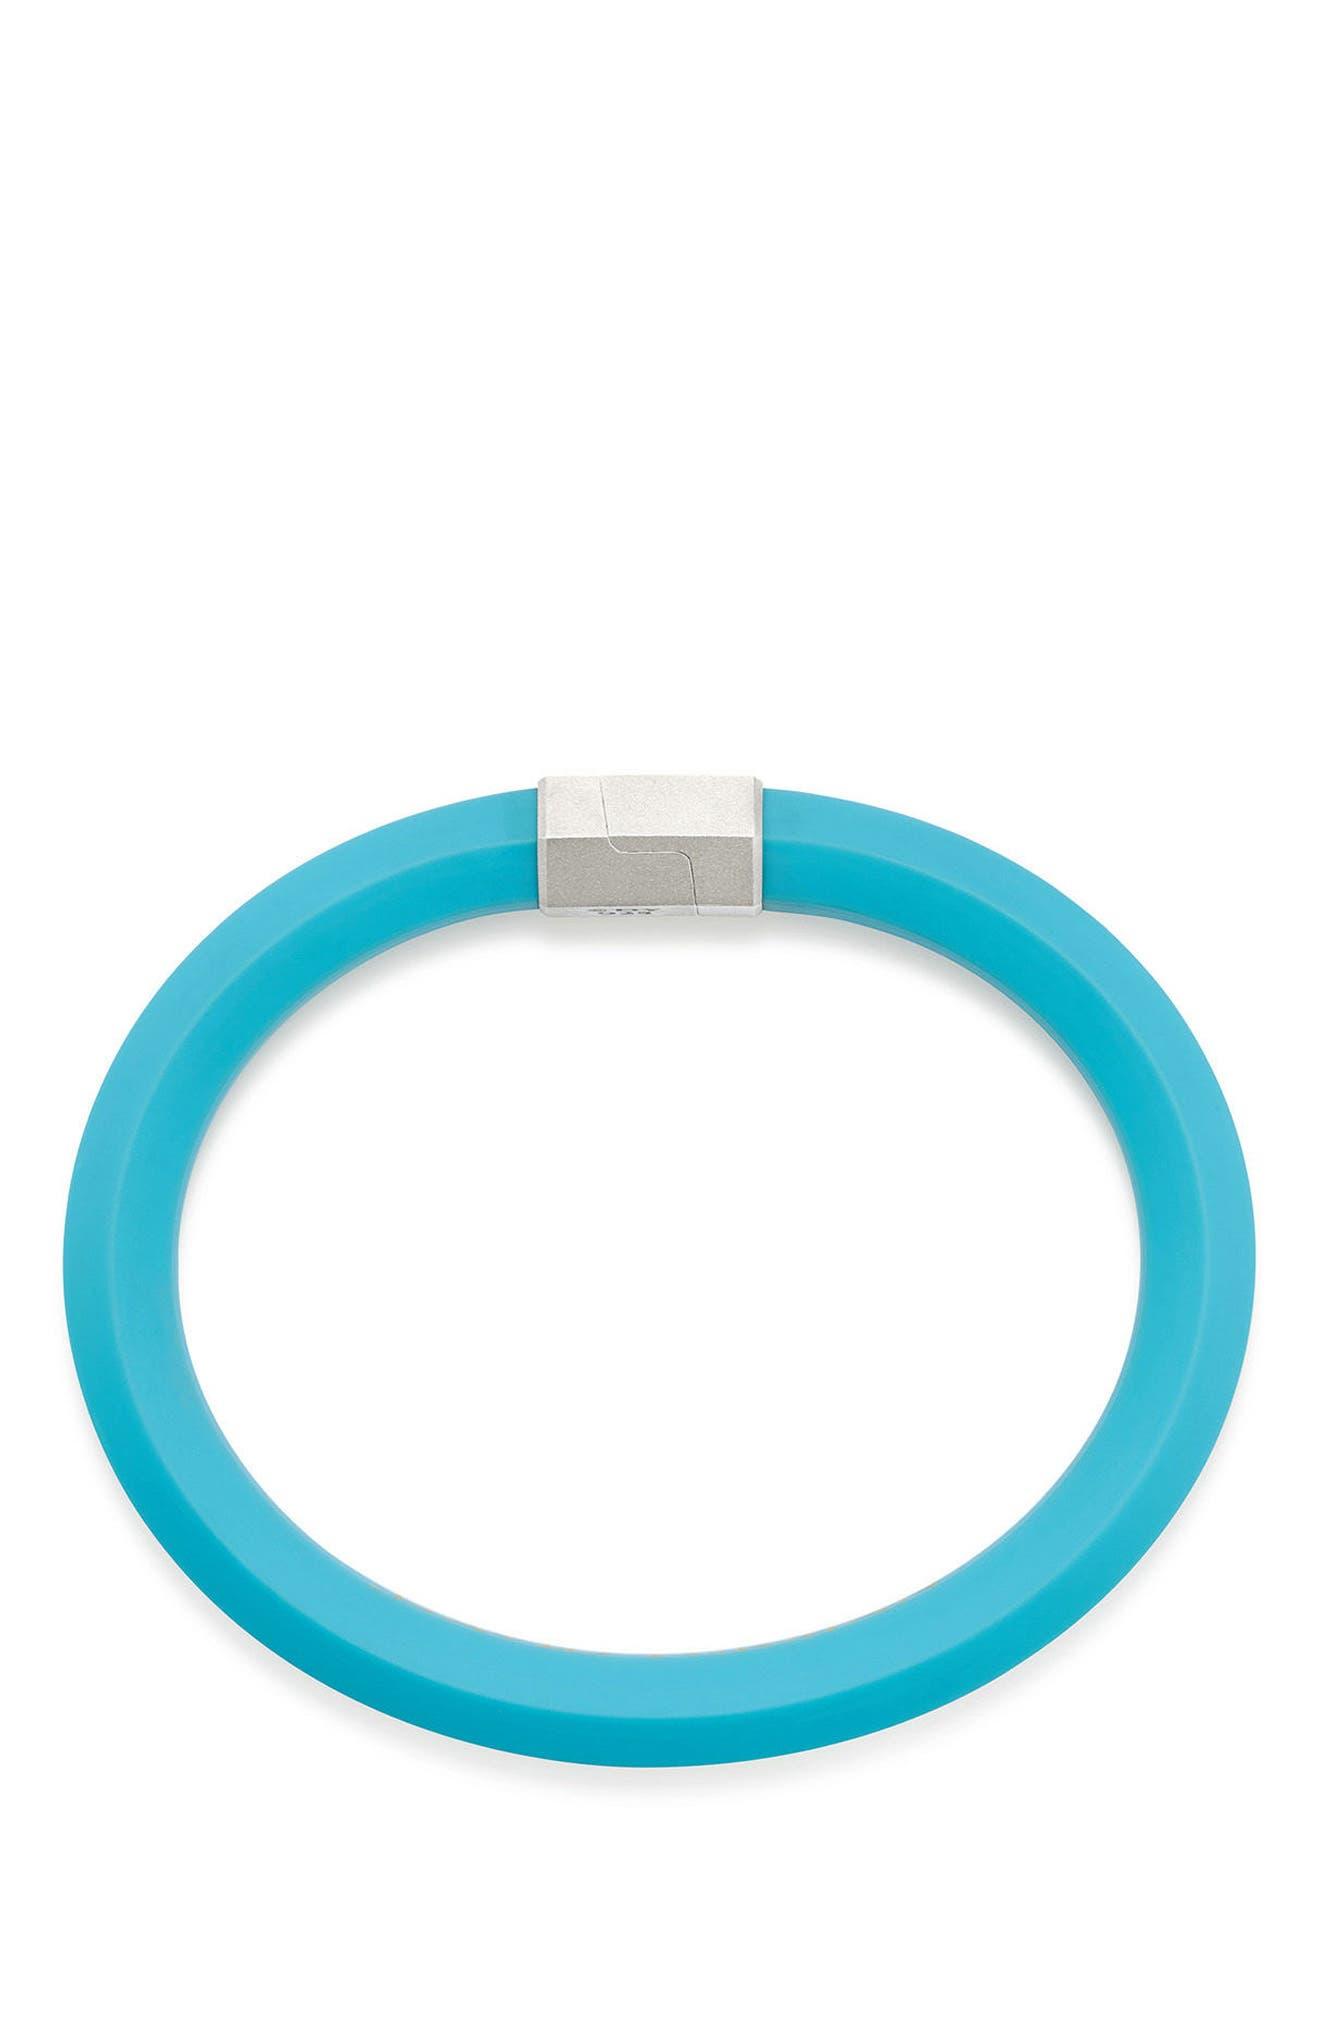 10.5mm Hex Bracelet,                             Alternate thumbnail 2, color,                             Teal